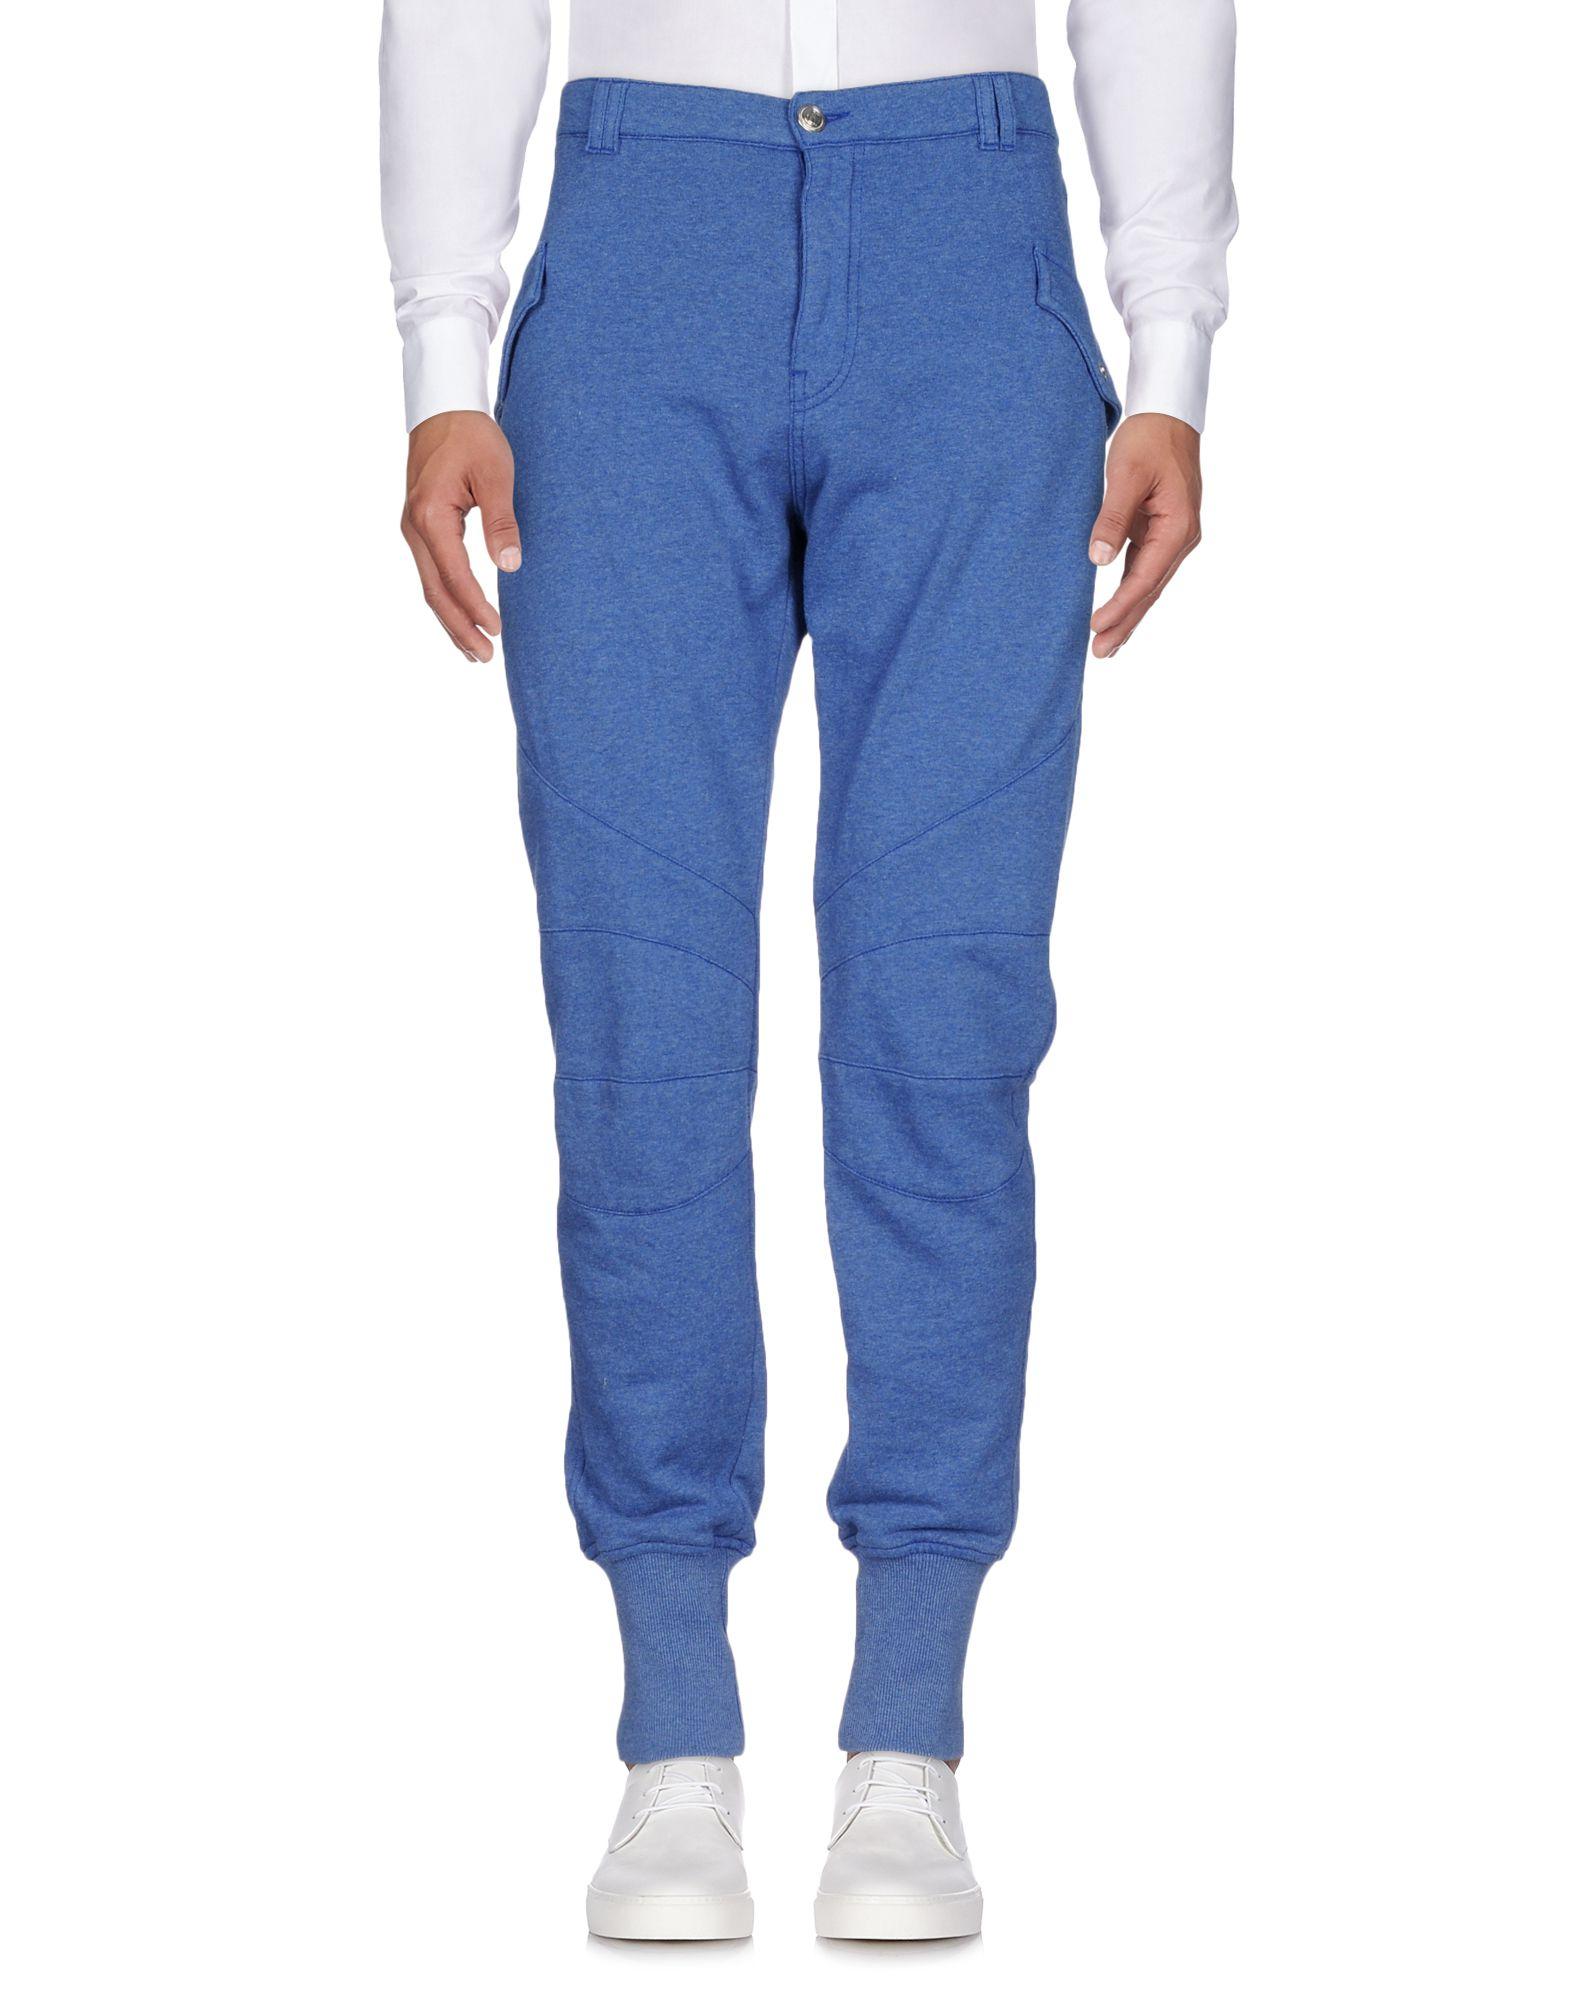 Pantalone Felpa Pierre Balmain Donna - Acquista online su